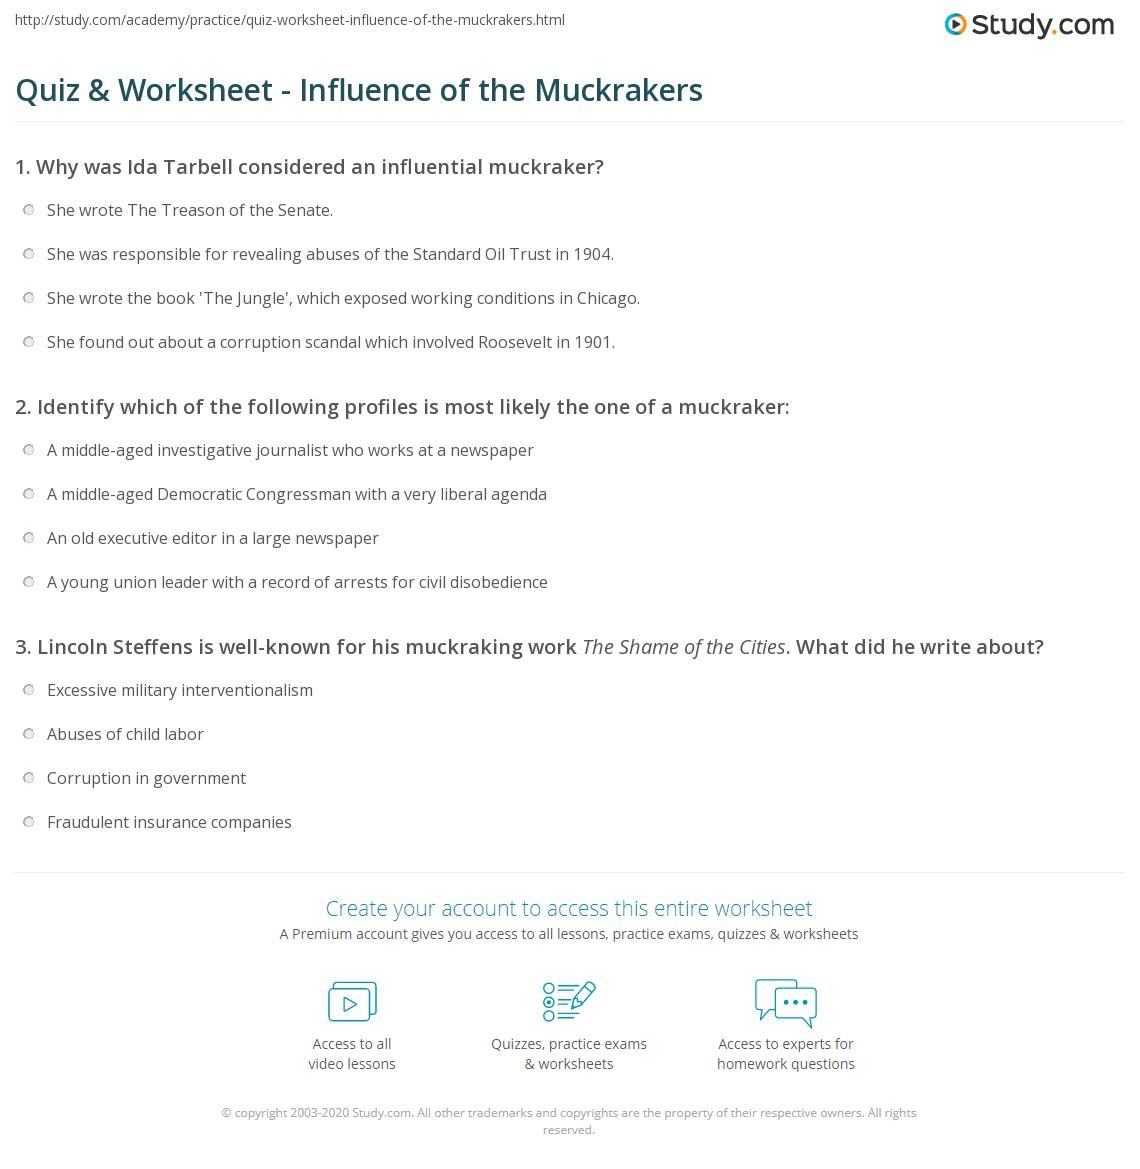 quiz worksheet influence of the muckrakers. Black Bedroom Furniture Sets. Home Design Ideas